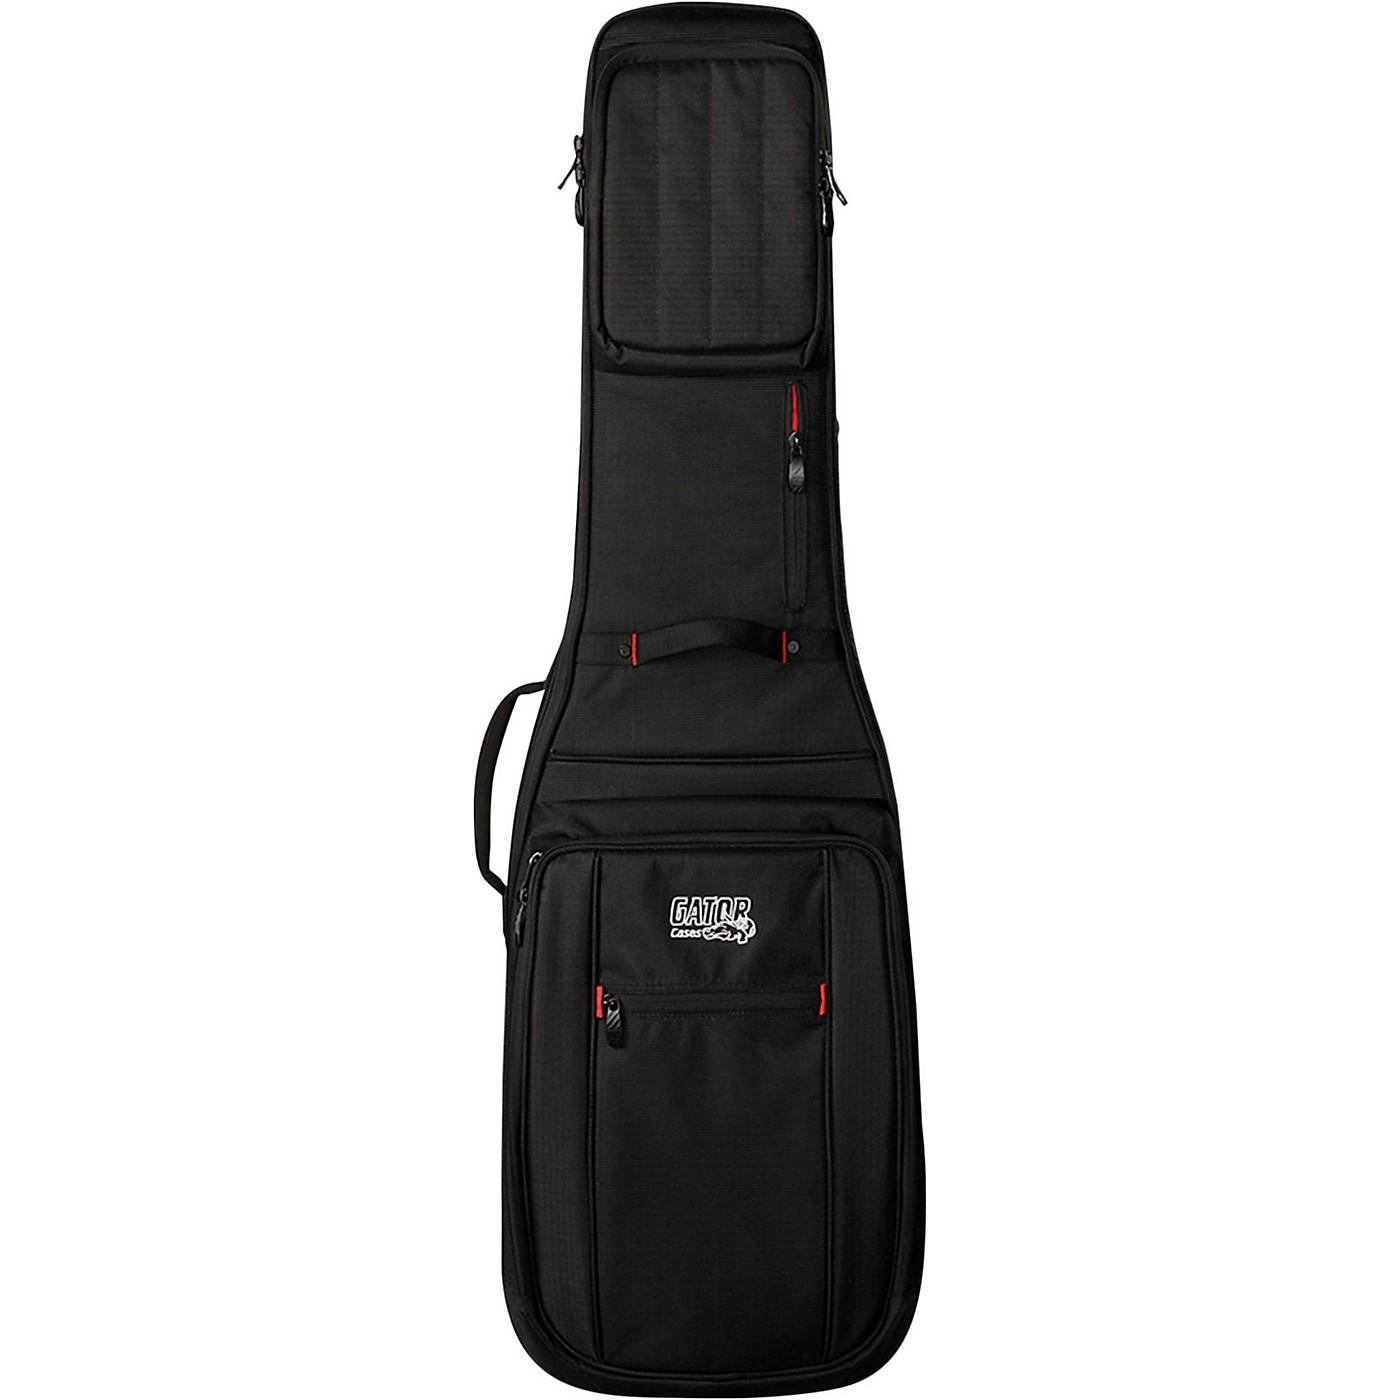 Gator G-PG BASS 2X ProGo Series Ultimate Gig Bag for 2 Bass Guitars thumbnail